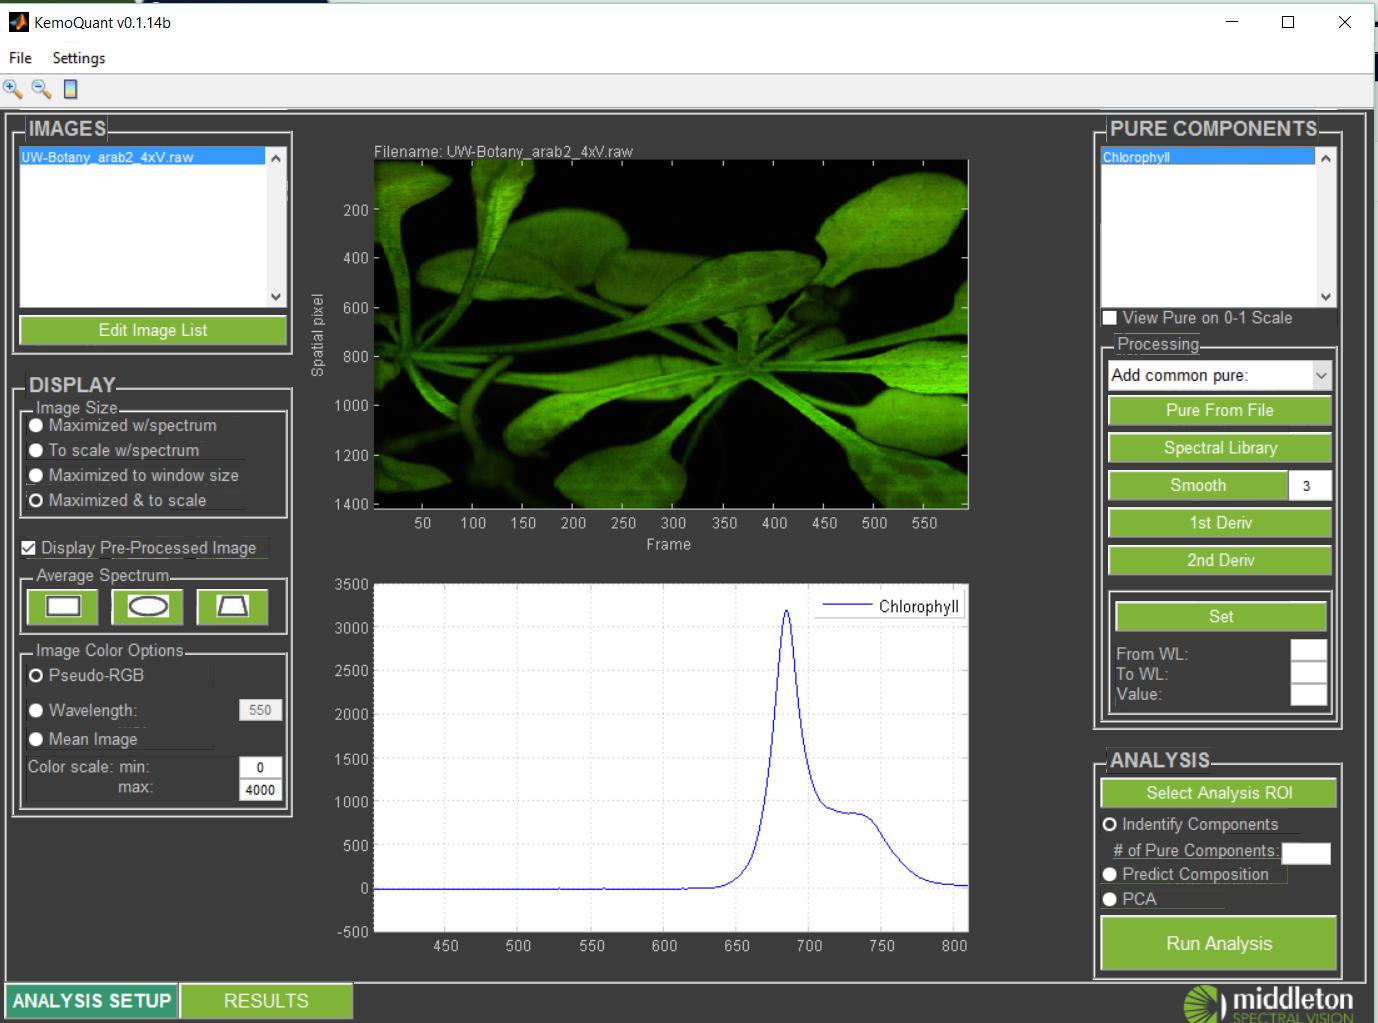 Macrophor Hyperspectral Fluorescence Imaging System